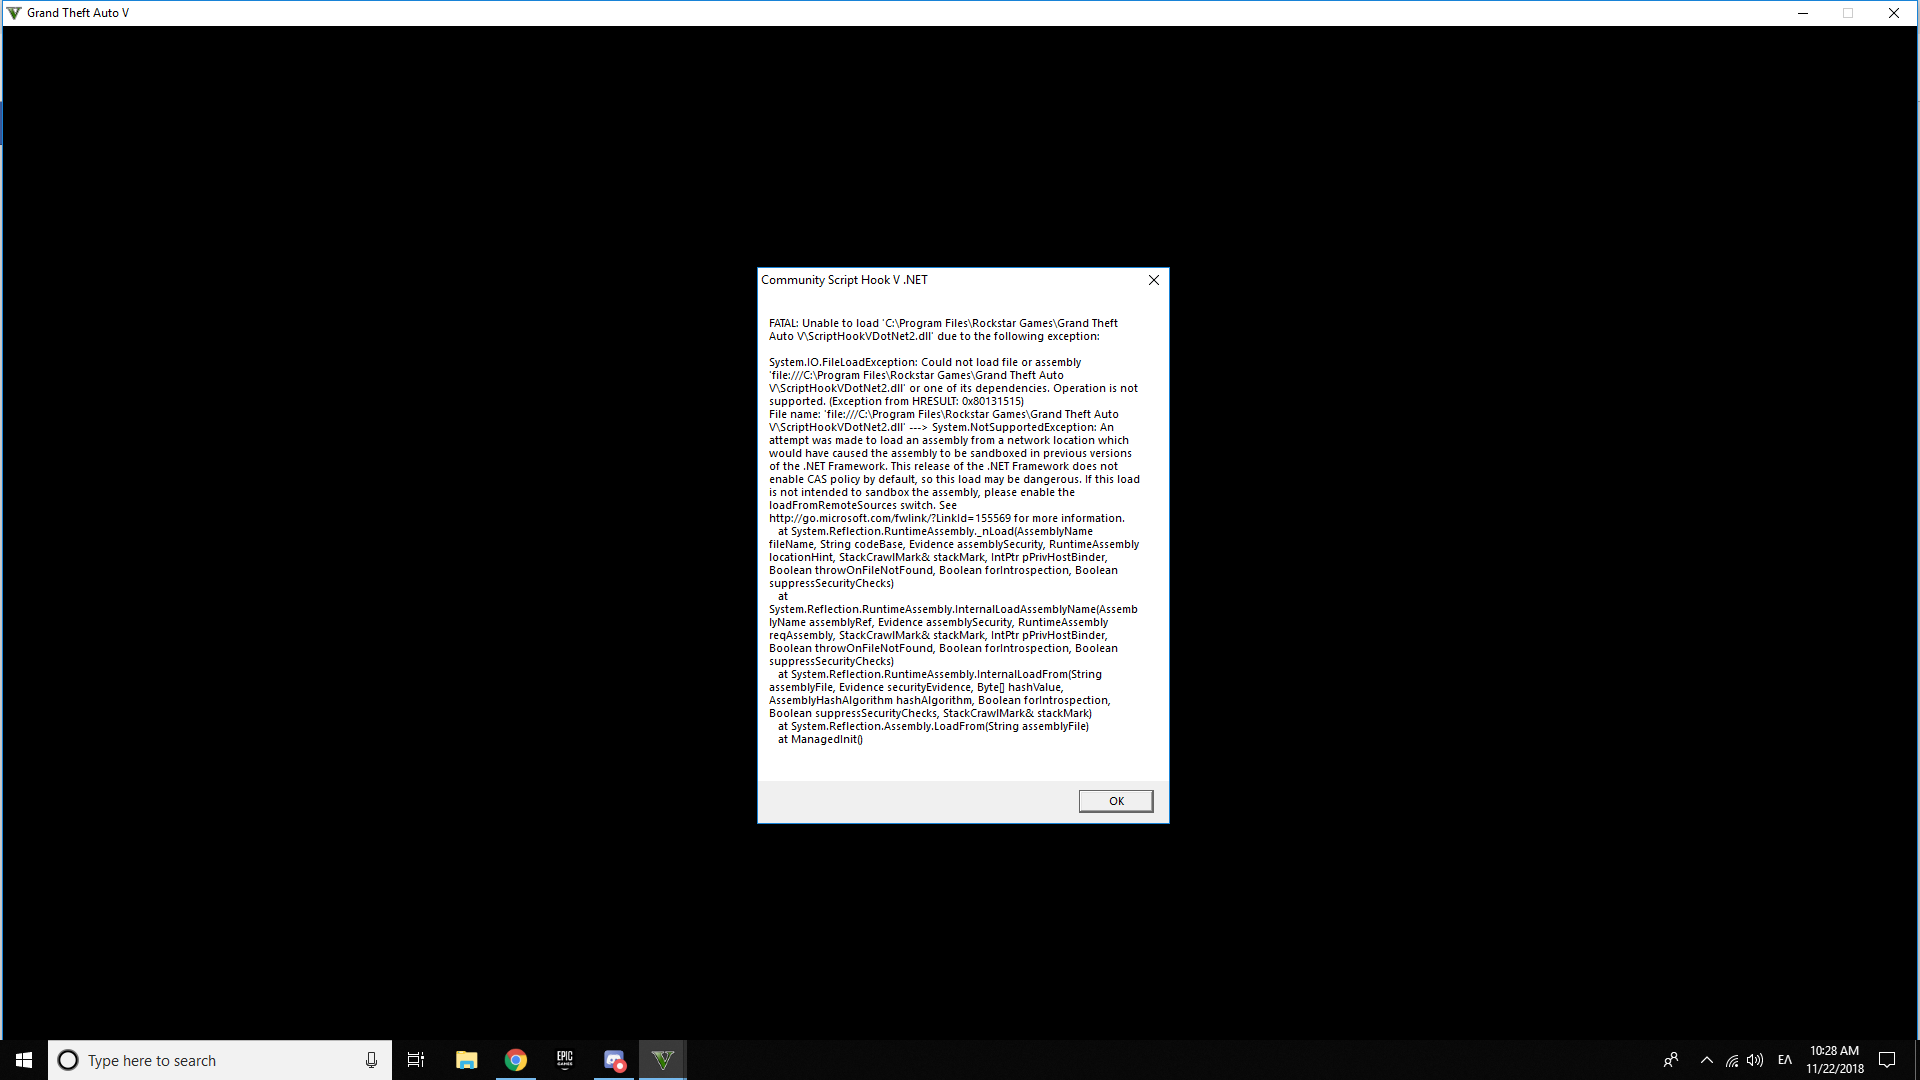 0_1543471405773_Screenshot (1).png